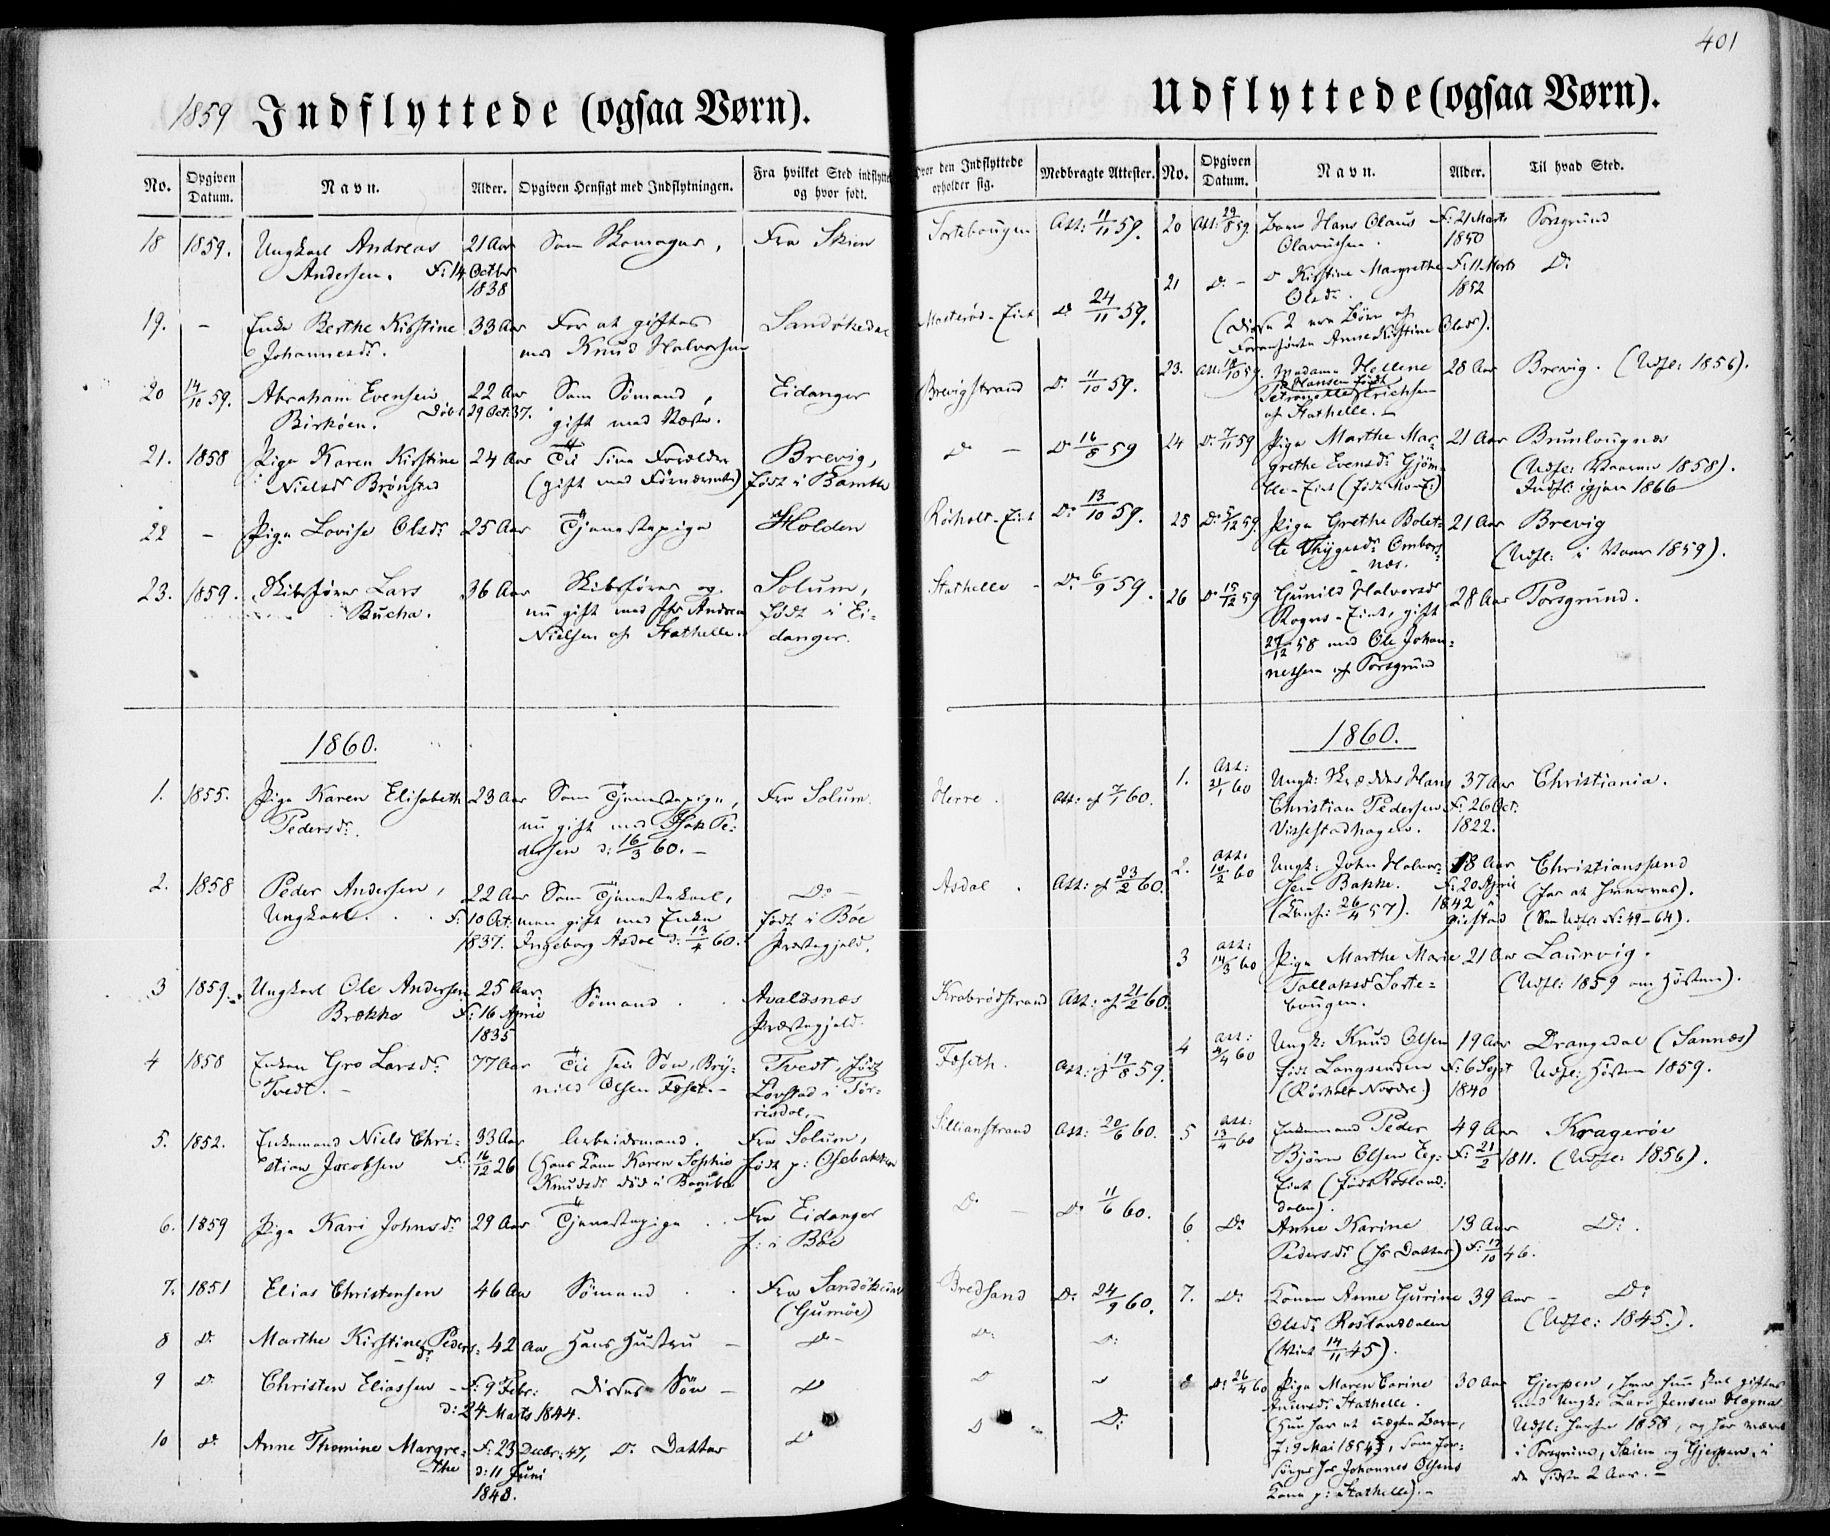 SAKO, Bamble kirkebøker, F/Fa/L0005: Ministerialbok nr. I 5, 1854-1869, s. 401